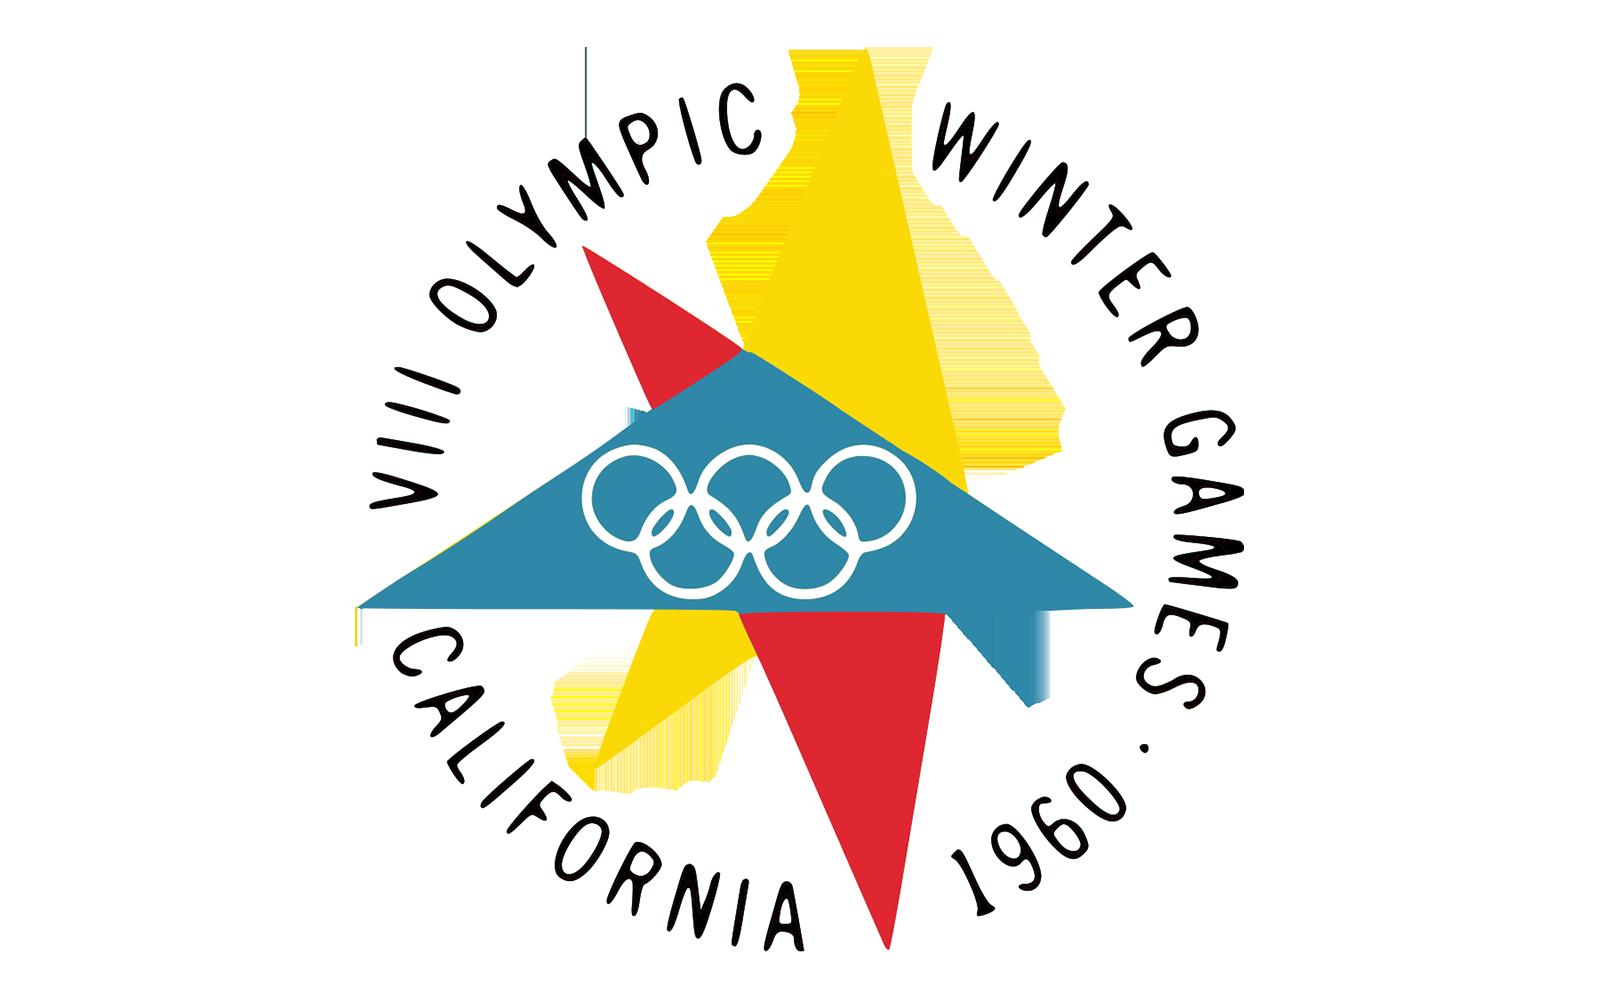 1960_California_Winter_Olympics_logo